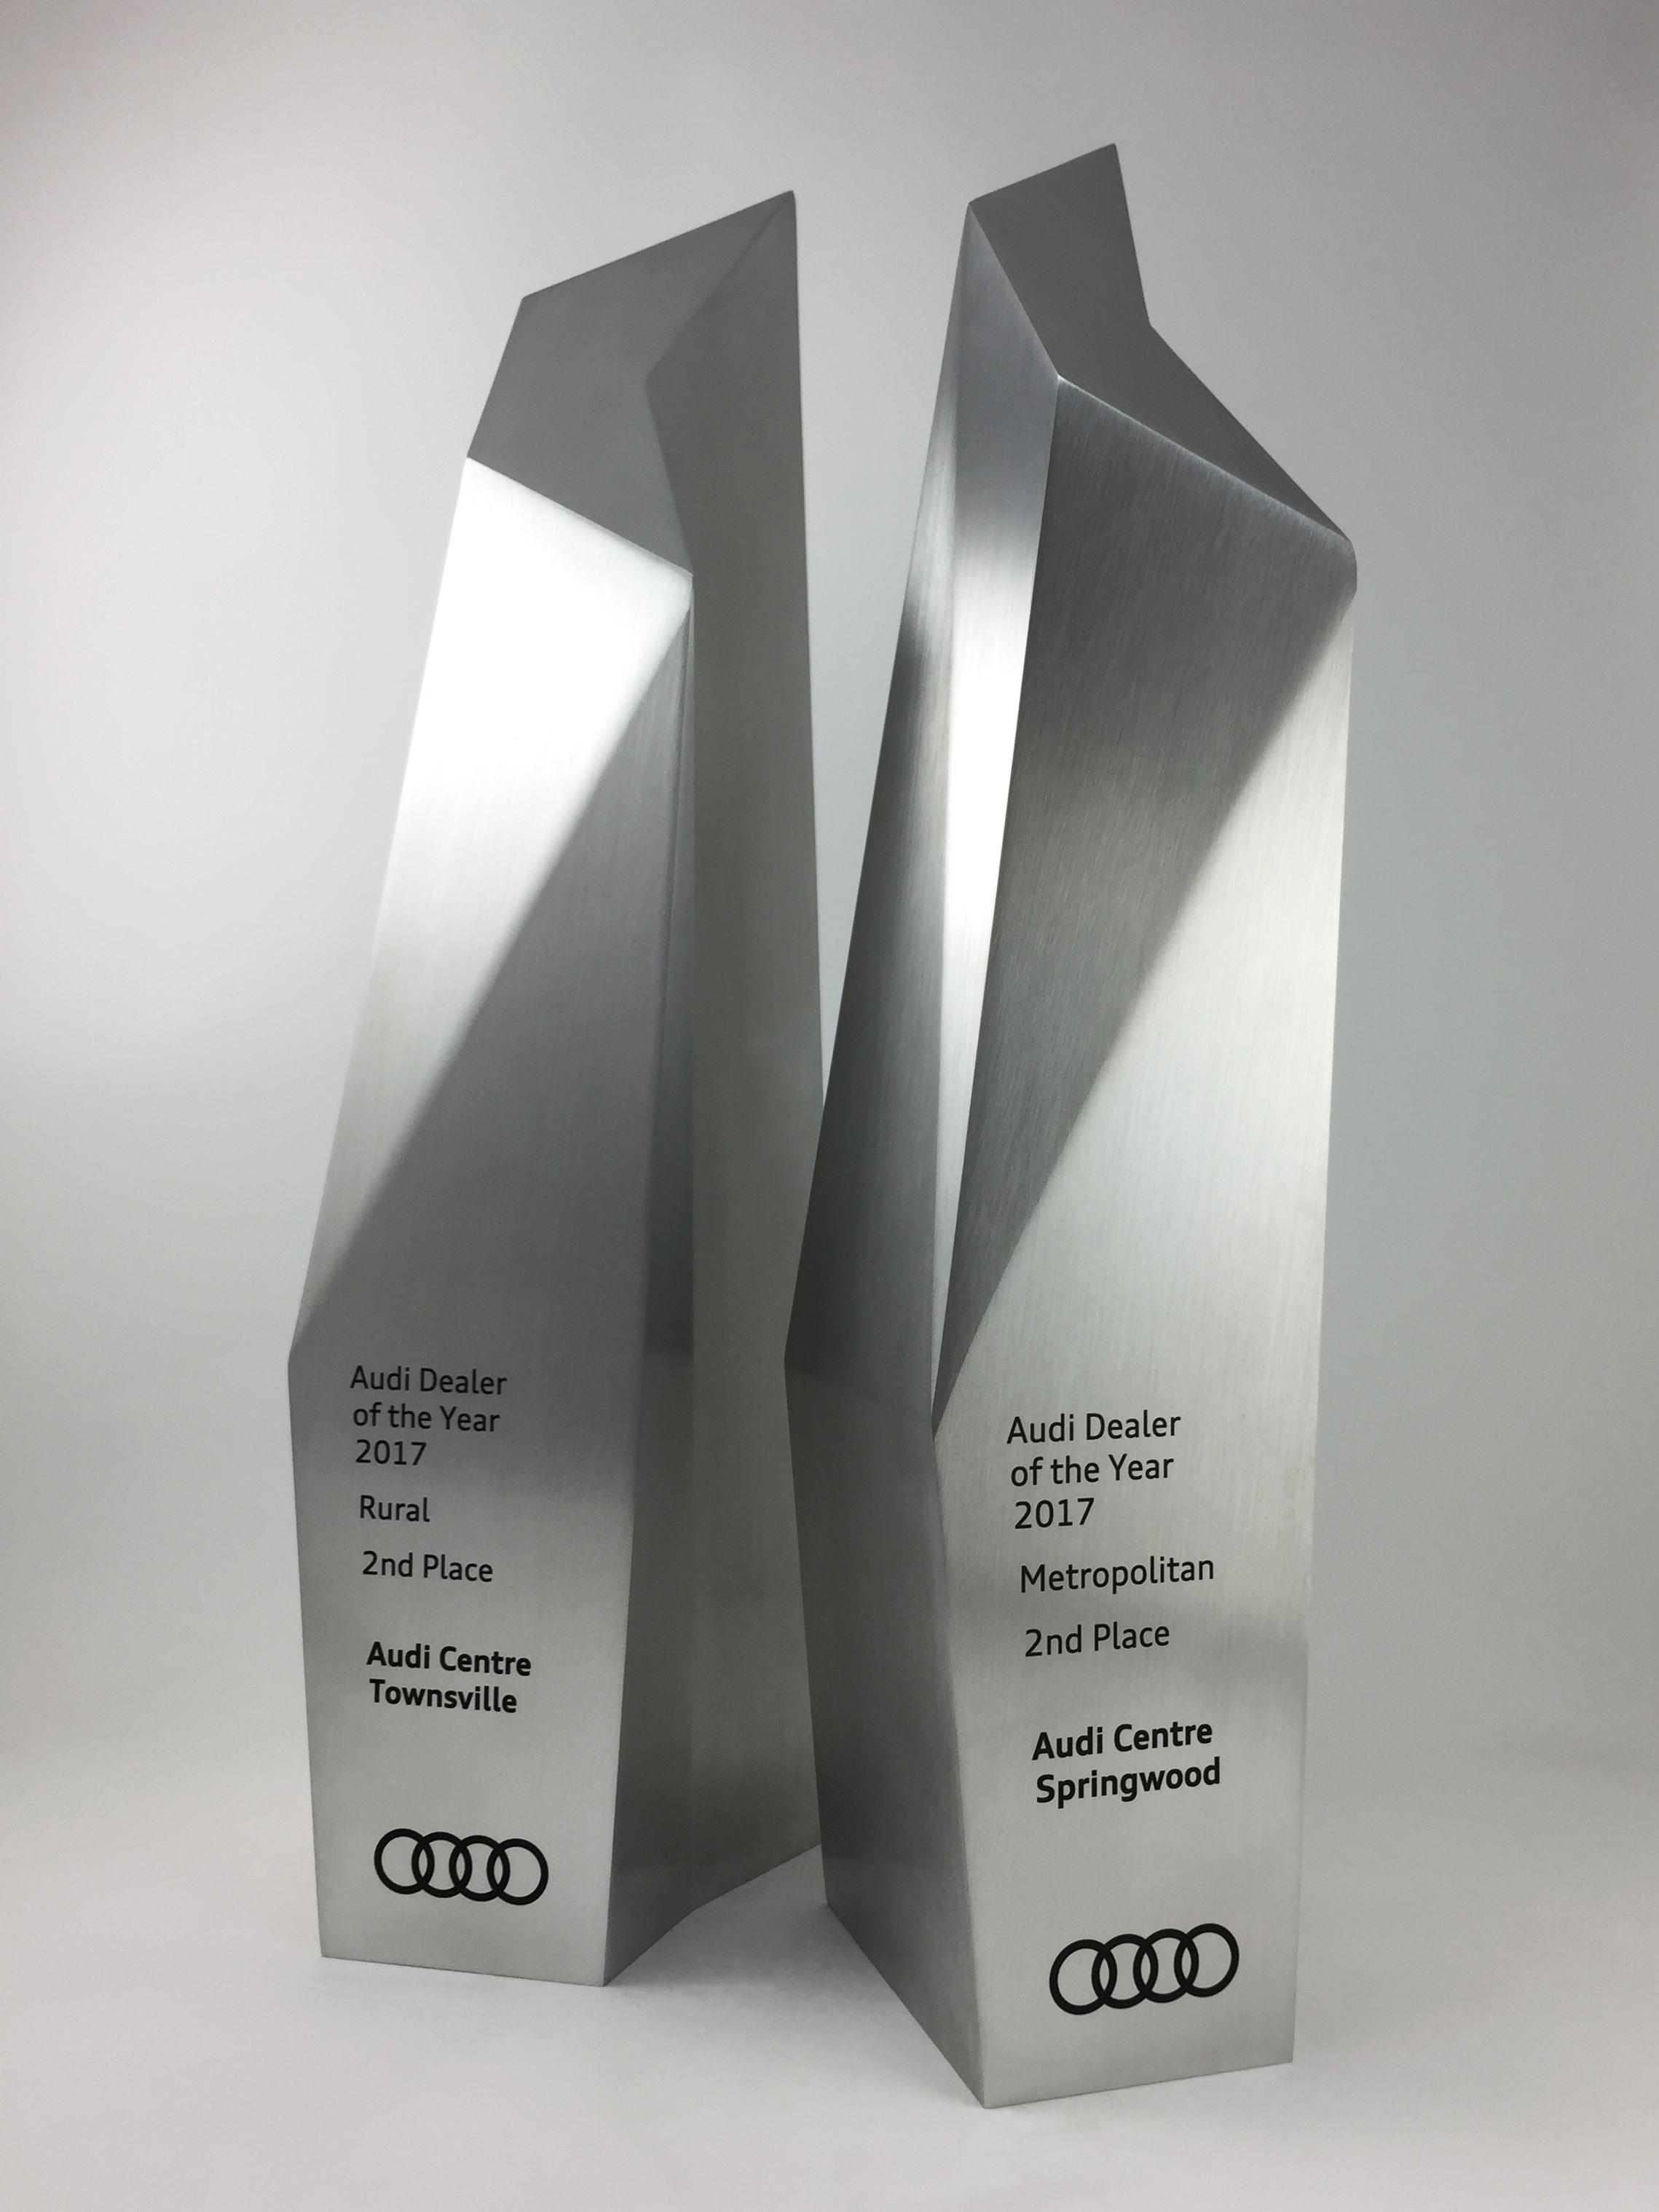 audi-metal-art-sculpture-award-trophy-05.jpg